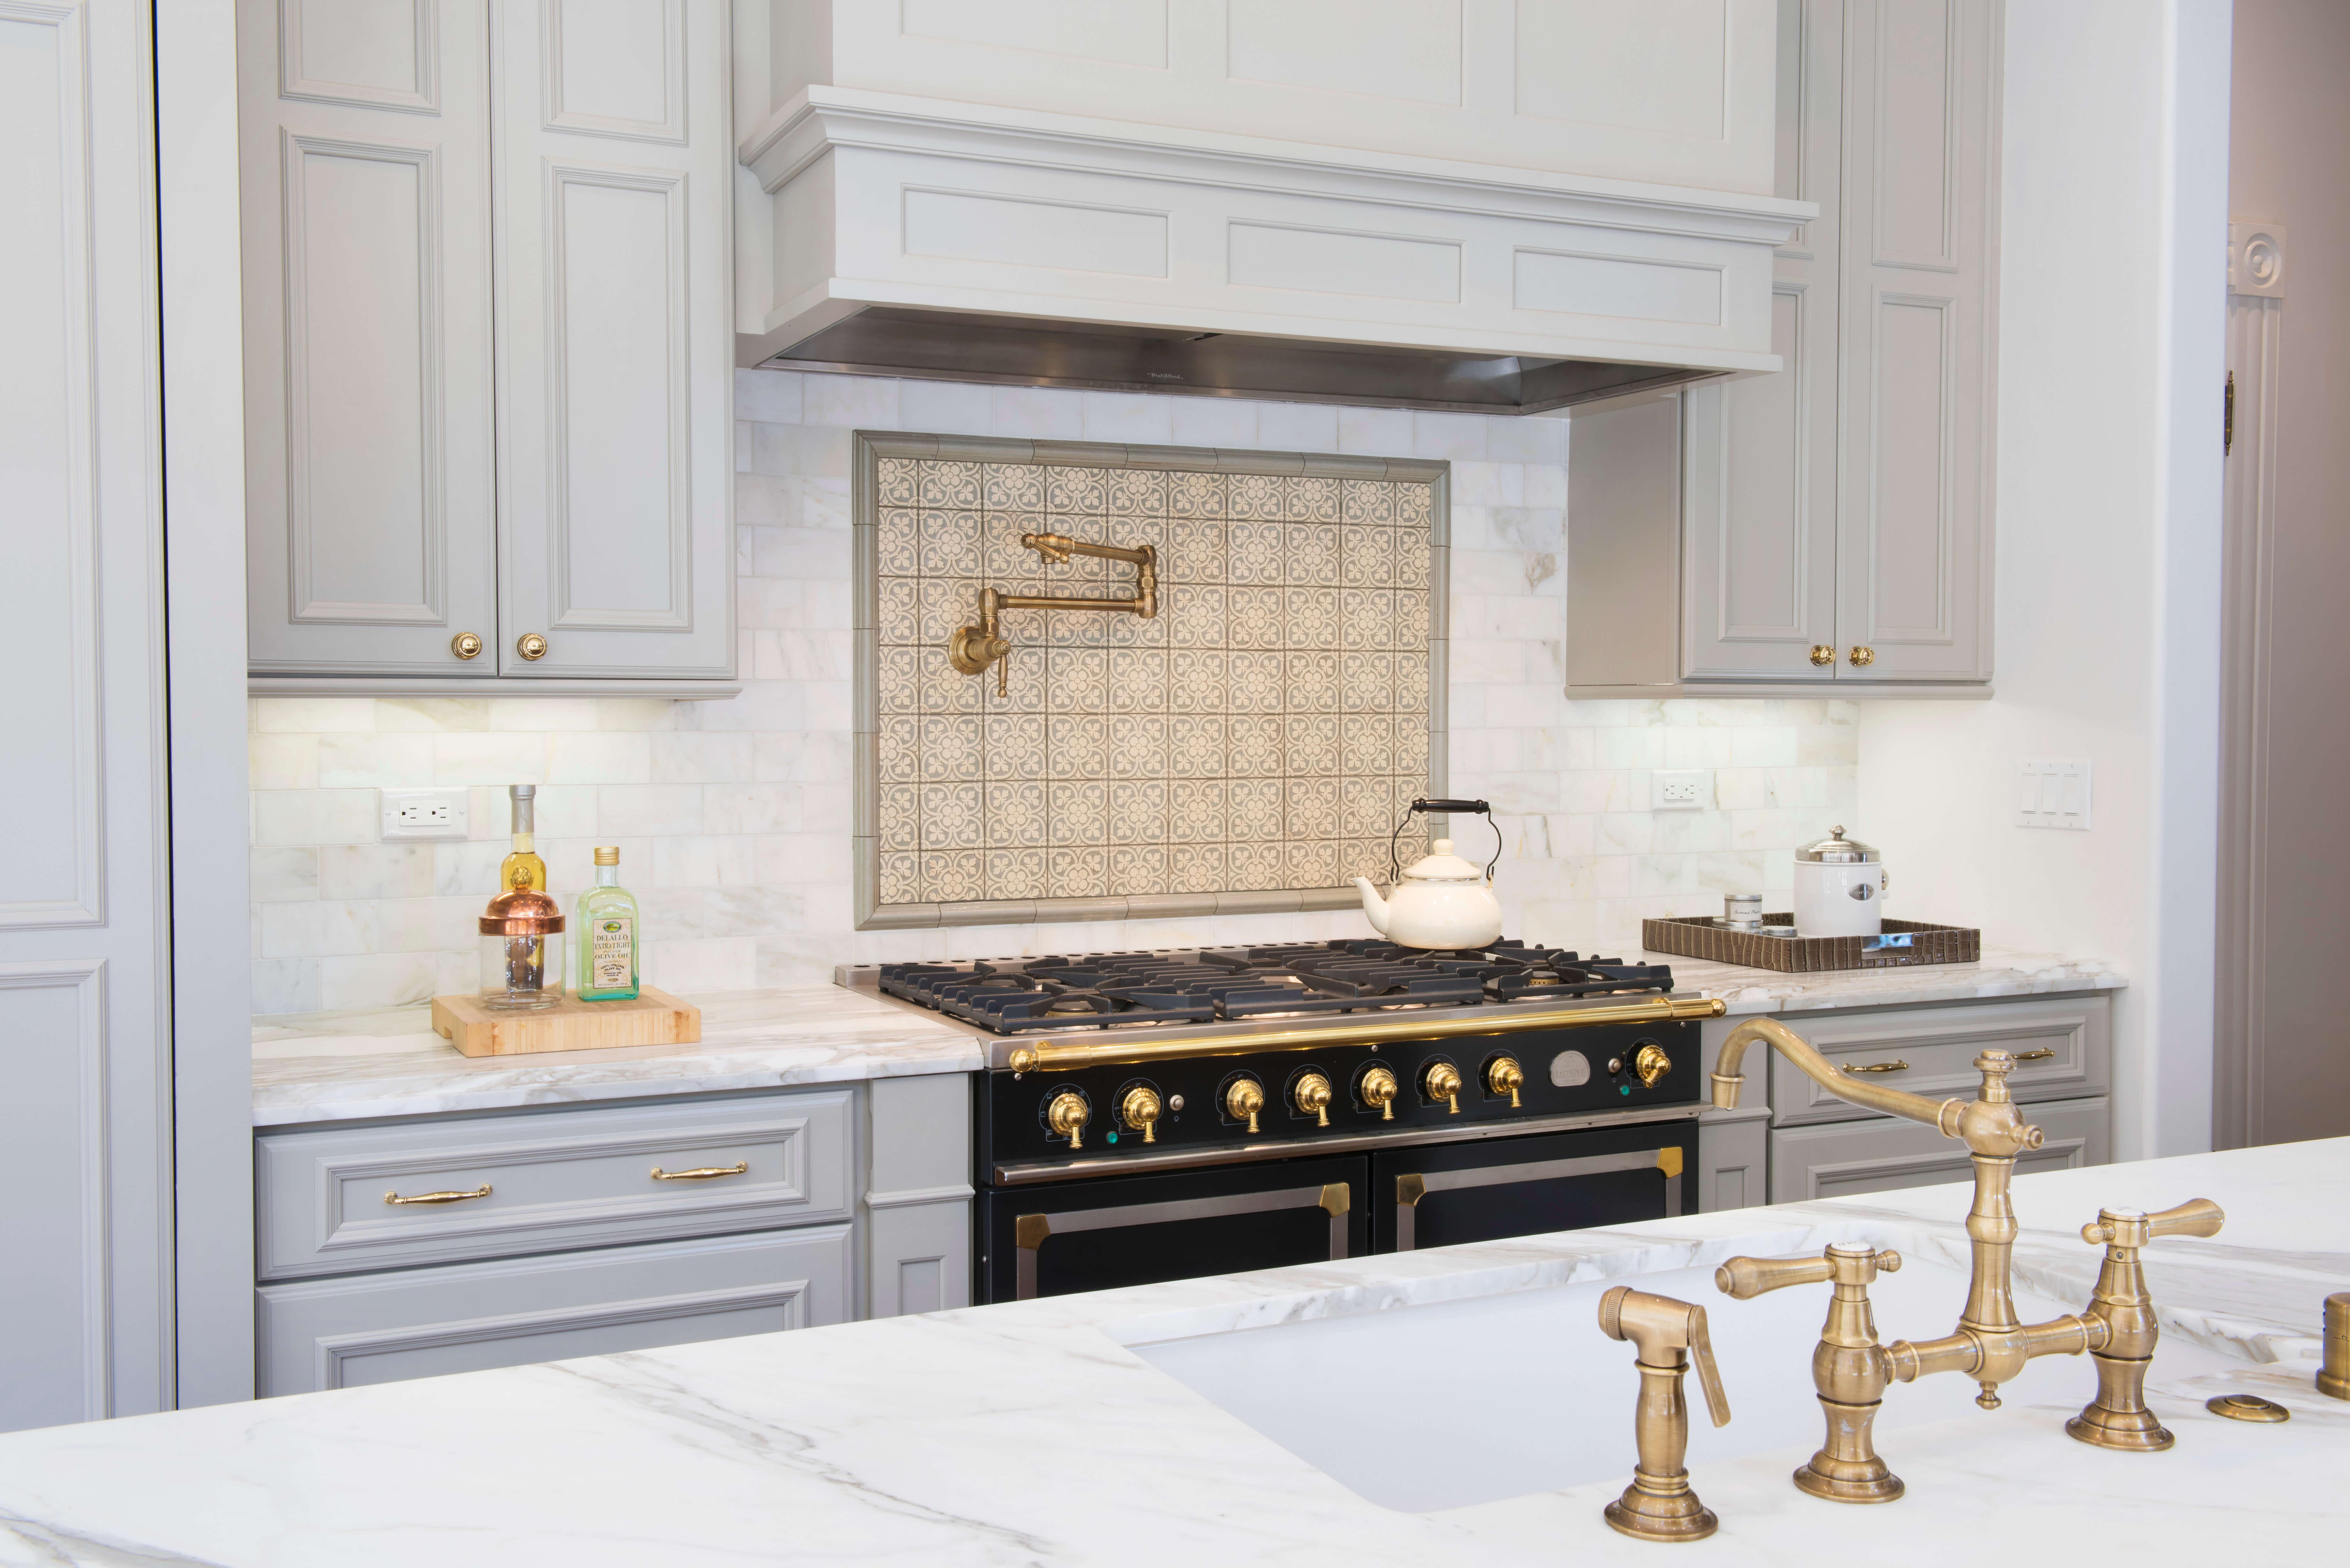 This elegant Dura Supreme kitchen adorned with brassy gold accents was designed by Joyce Van Den Dungen Bille of Gilmans Kitchens and Baths, California.